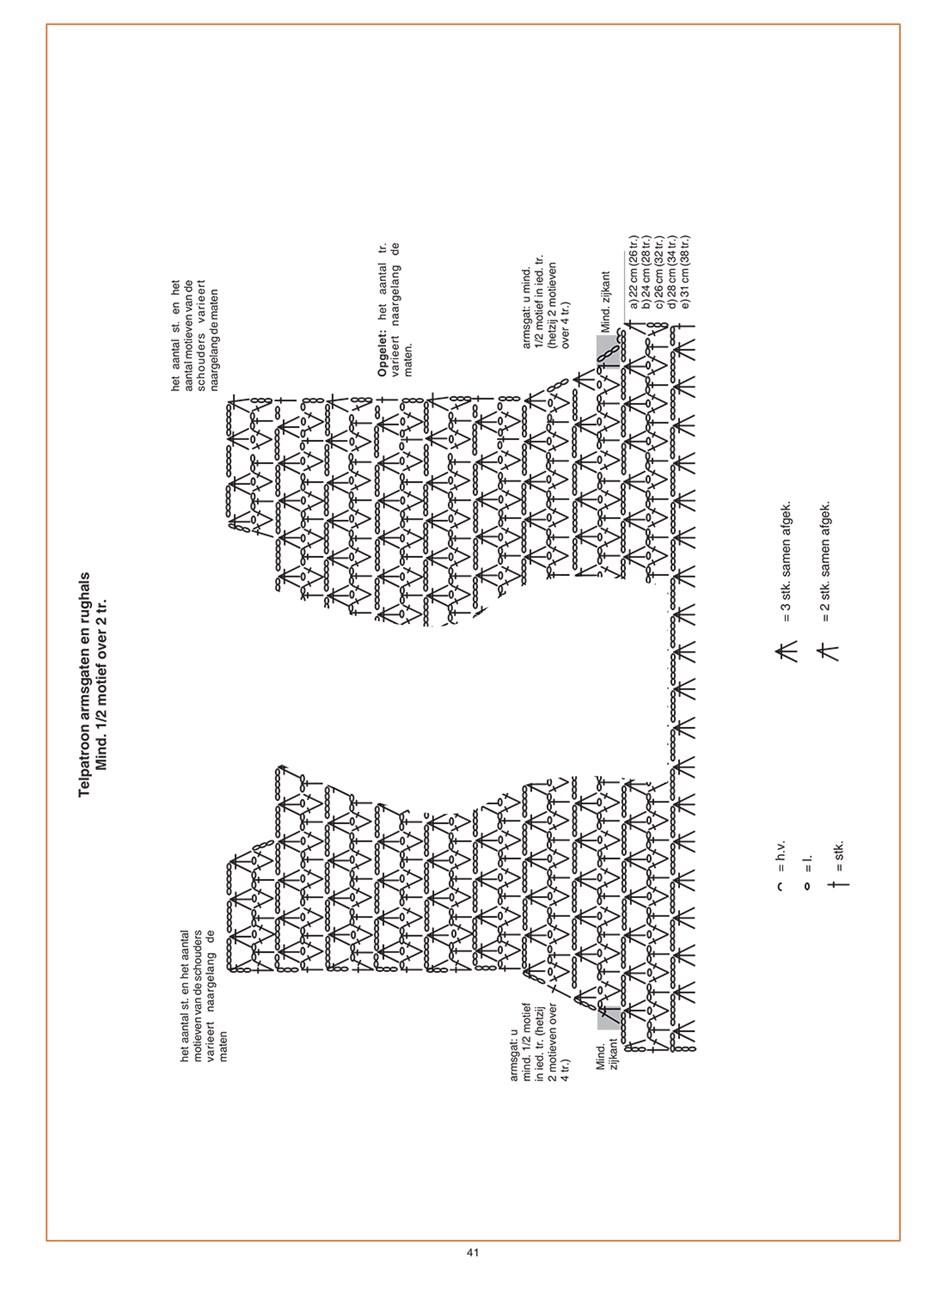 patroon deel 3